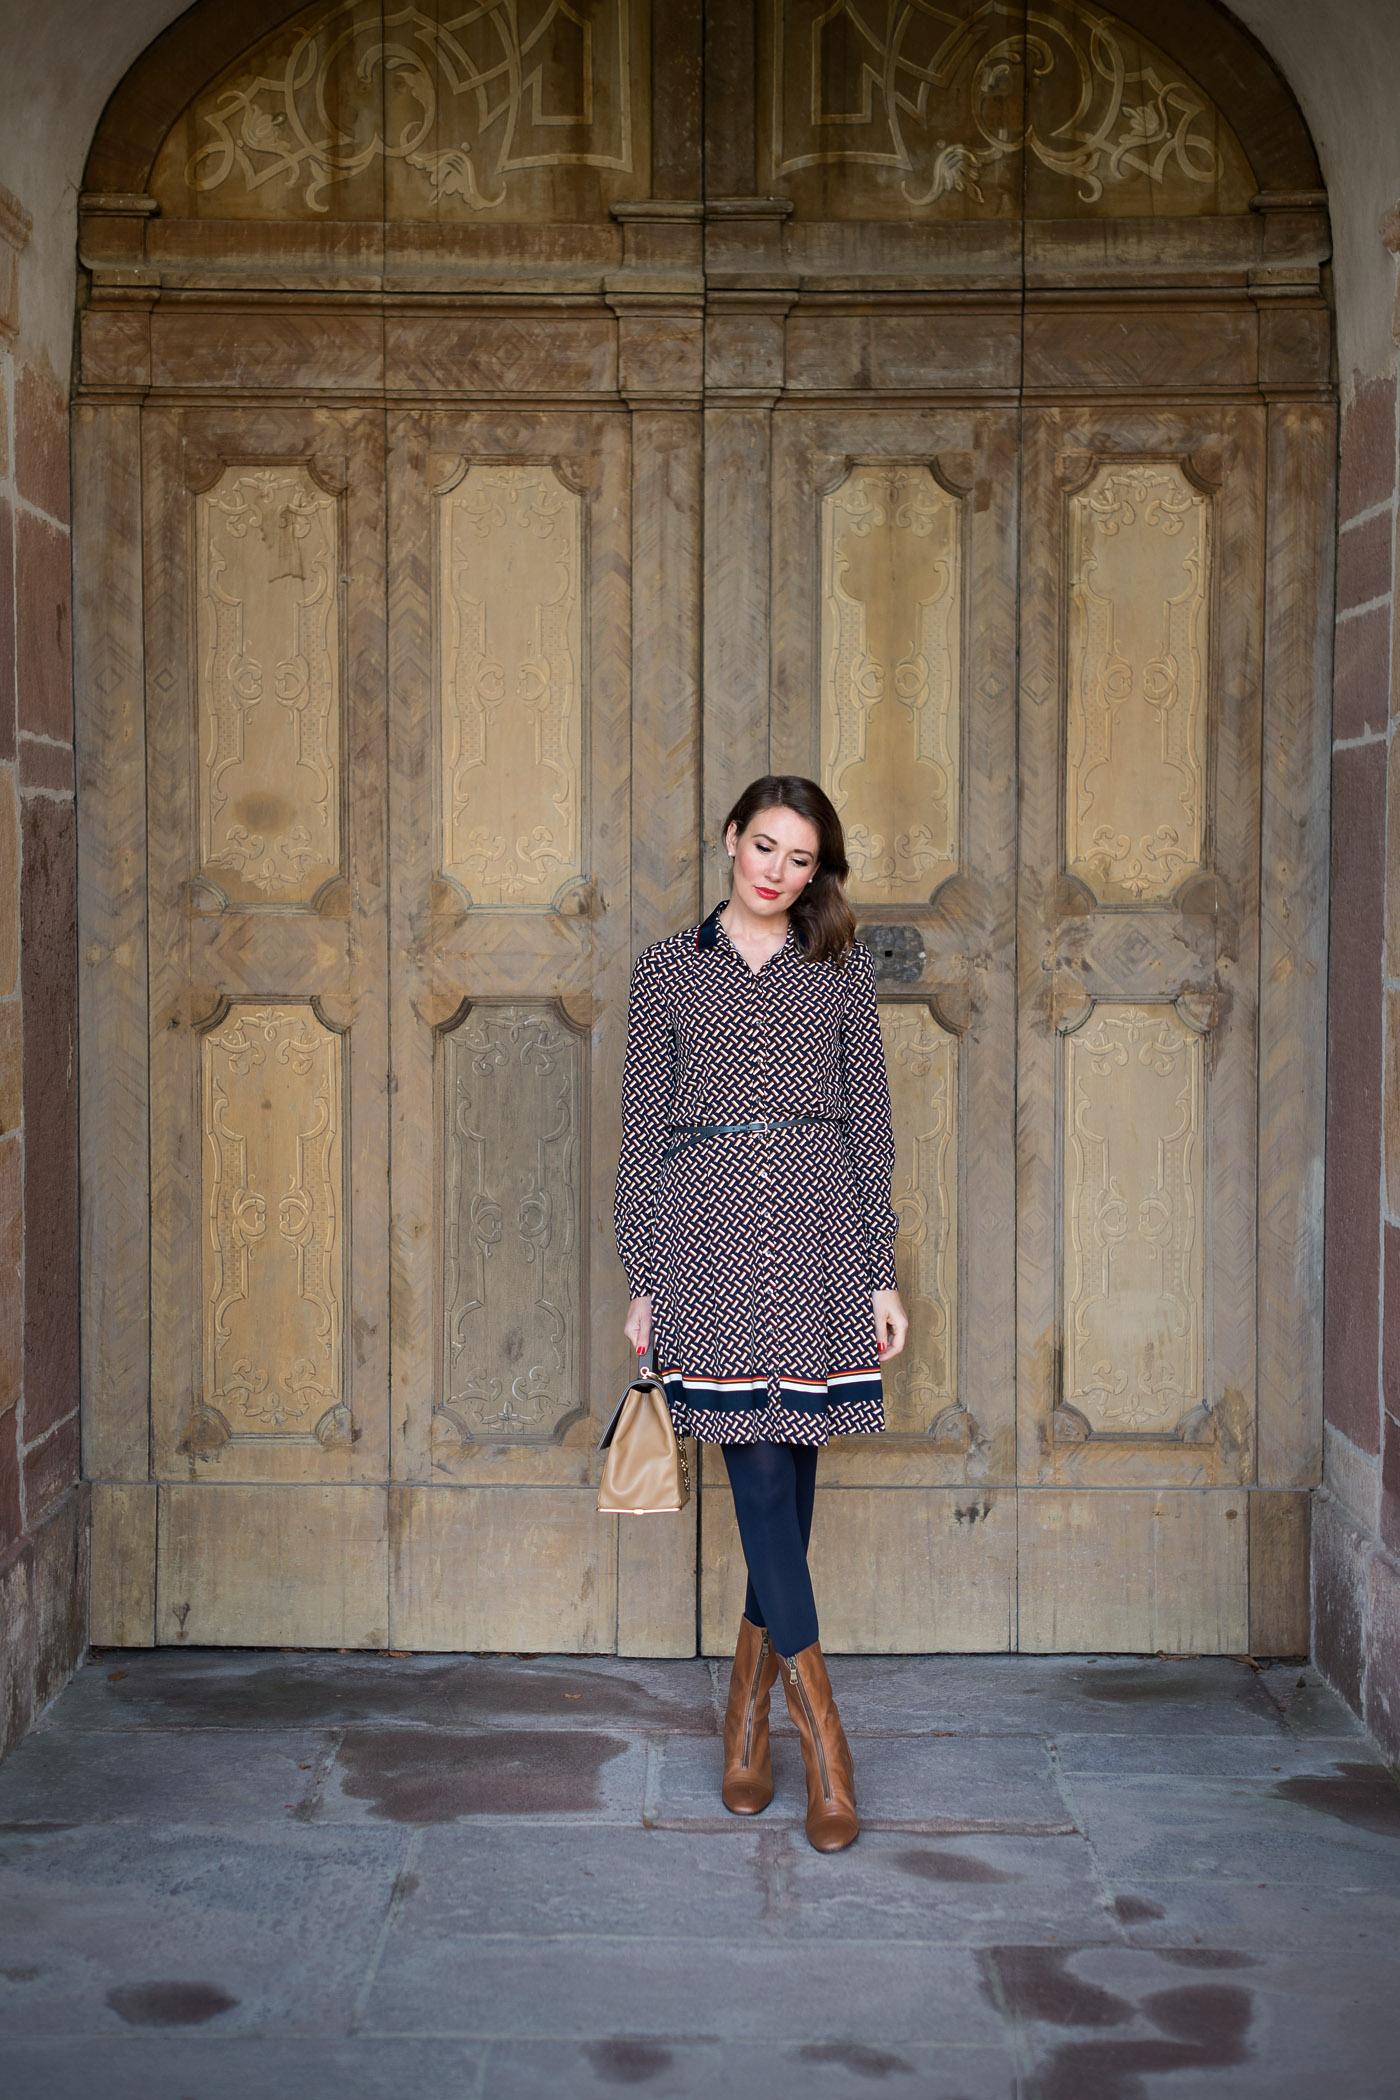 tommy-hilfiger-kleid-dress-zara-bag-booties-fall-fashion-fashionblog-3